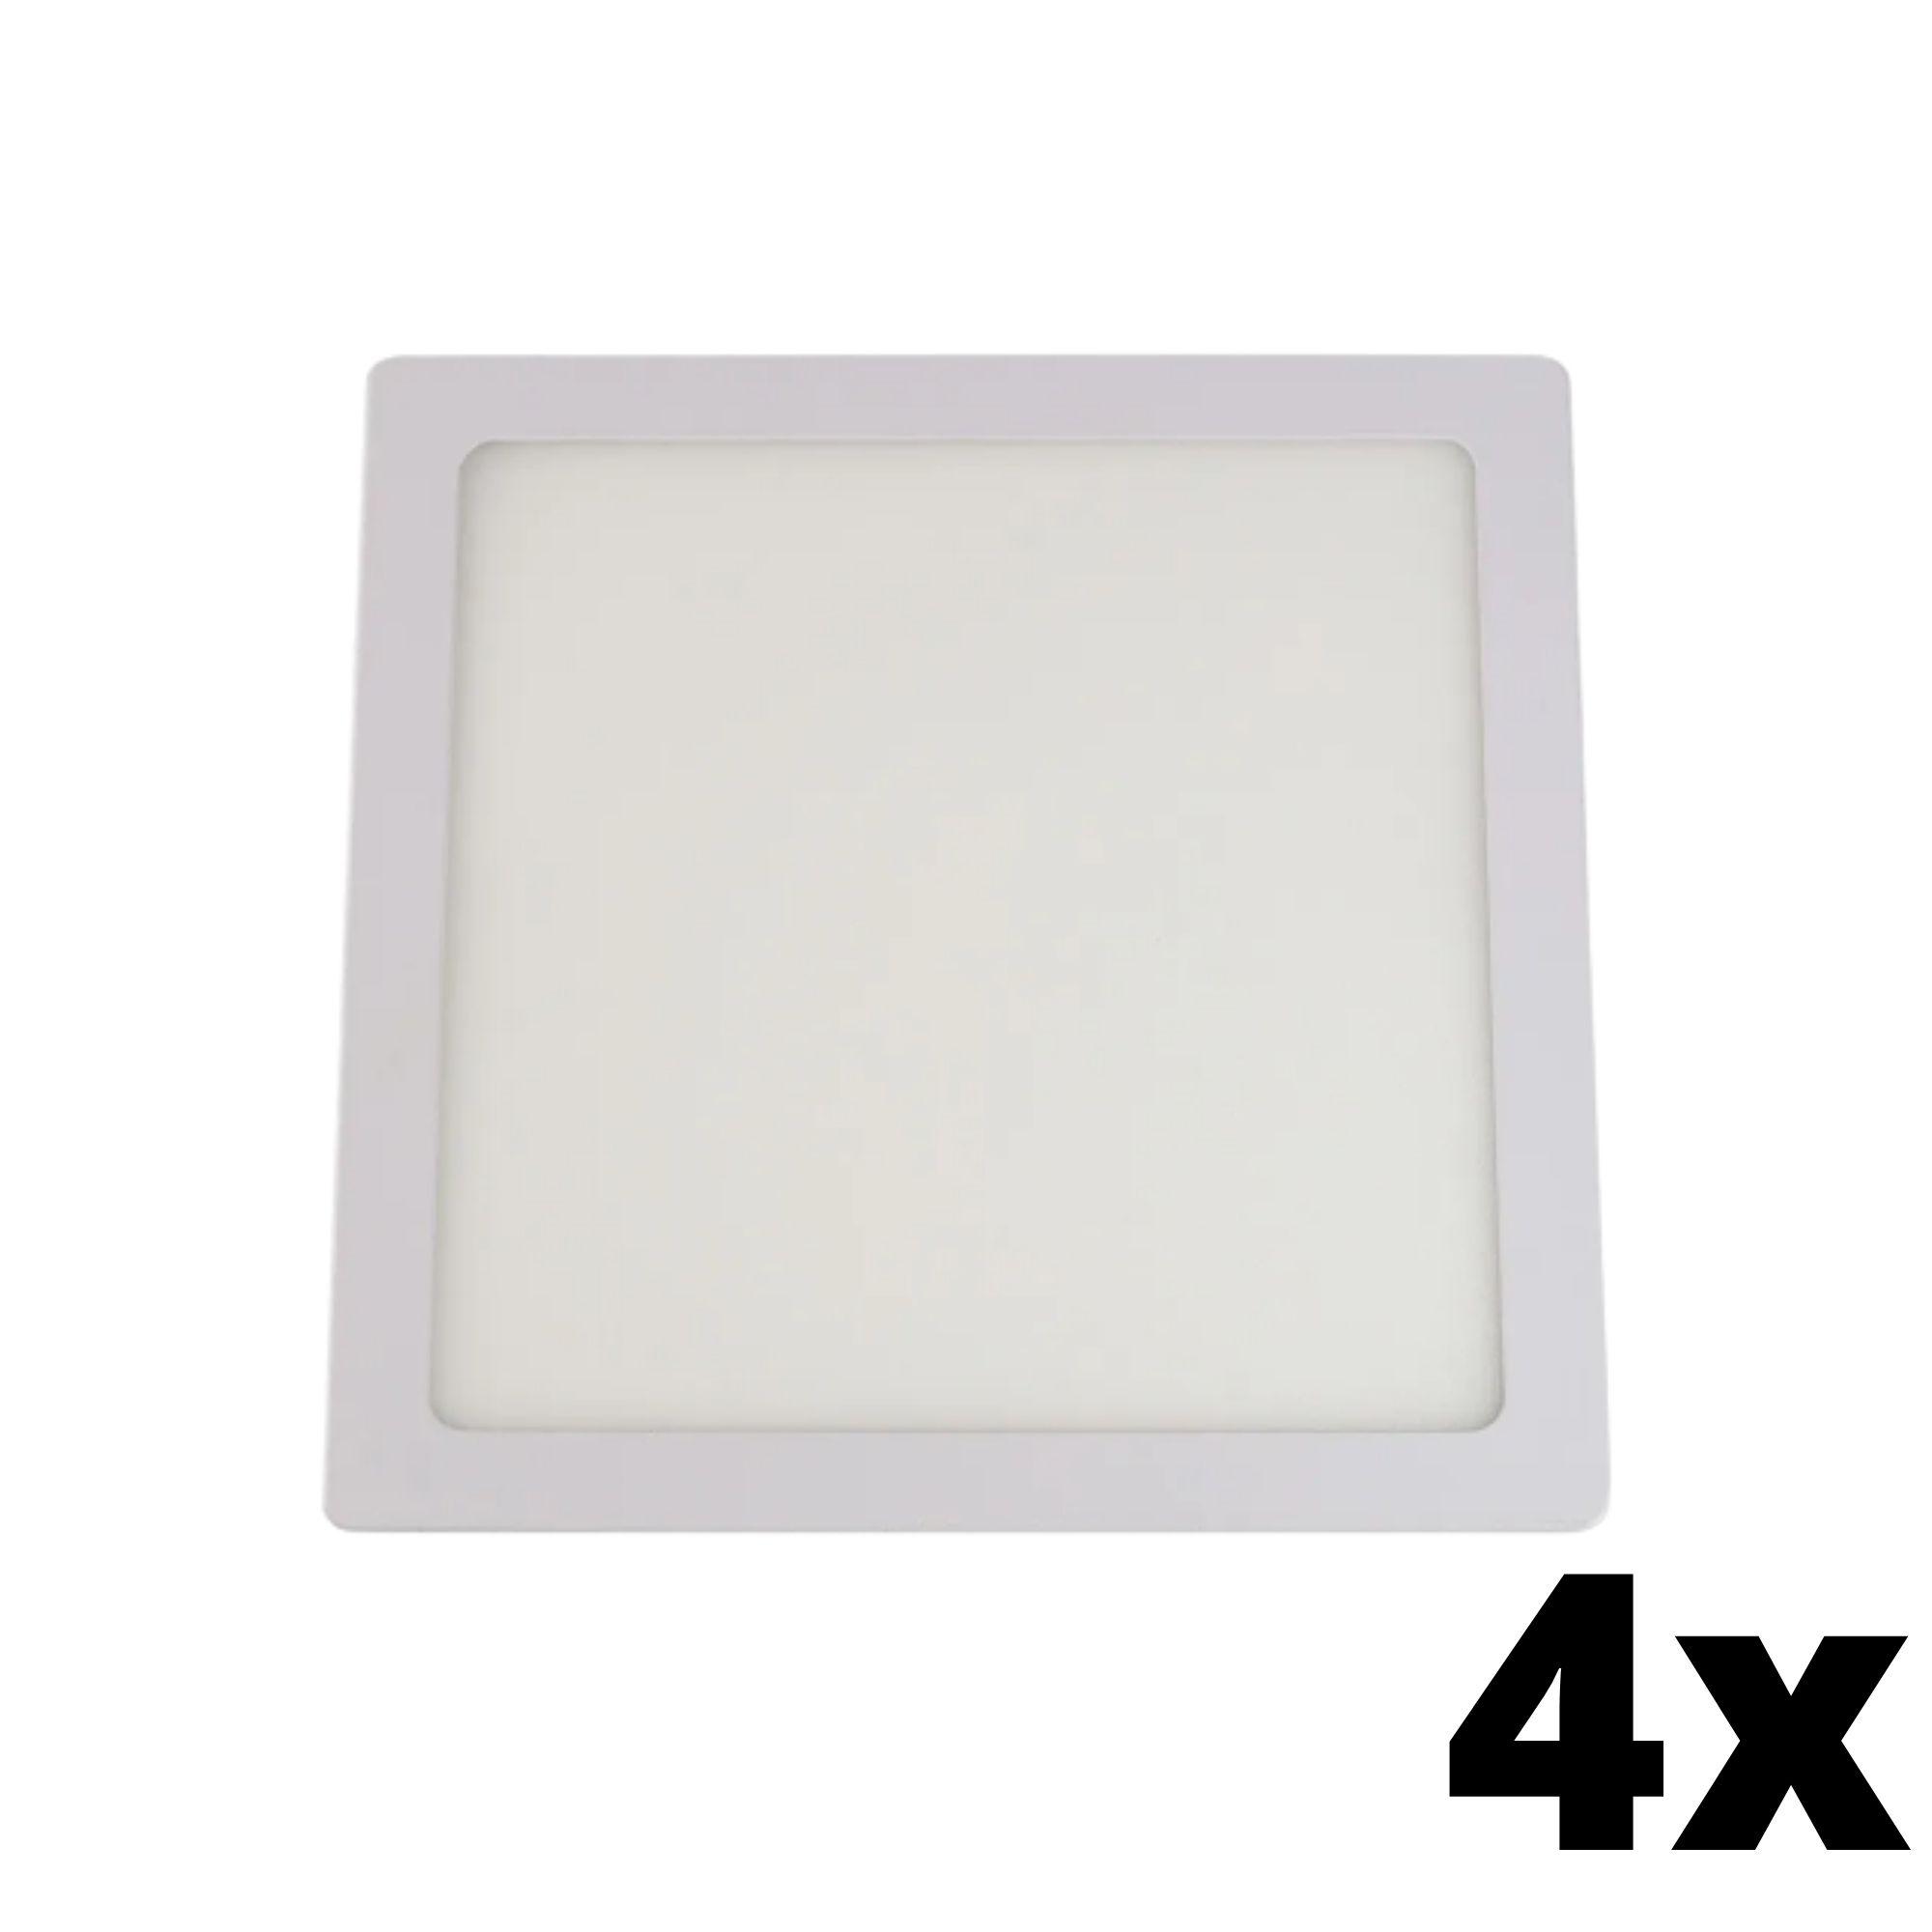 Kit 4 und Painel de Led Embutir 18w Quadrado 6500k